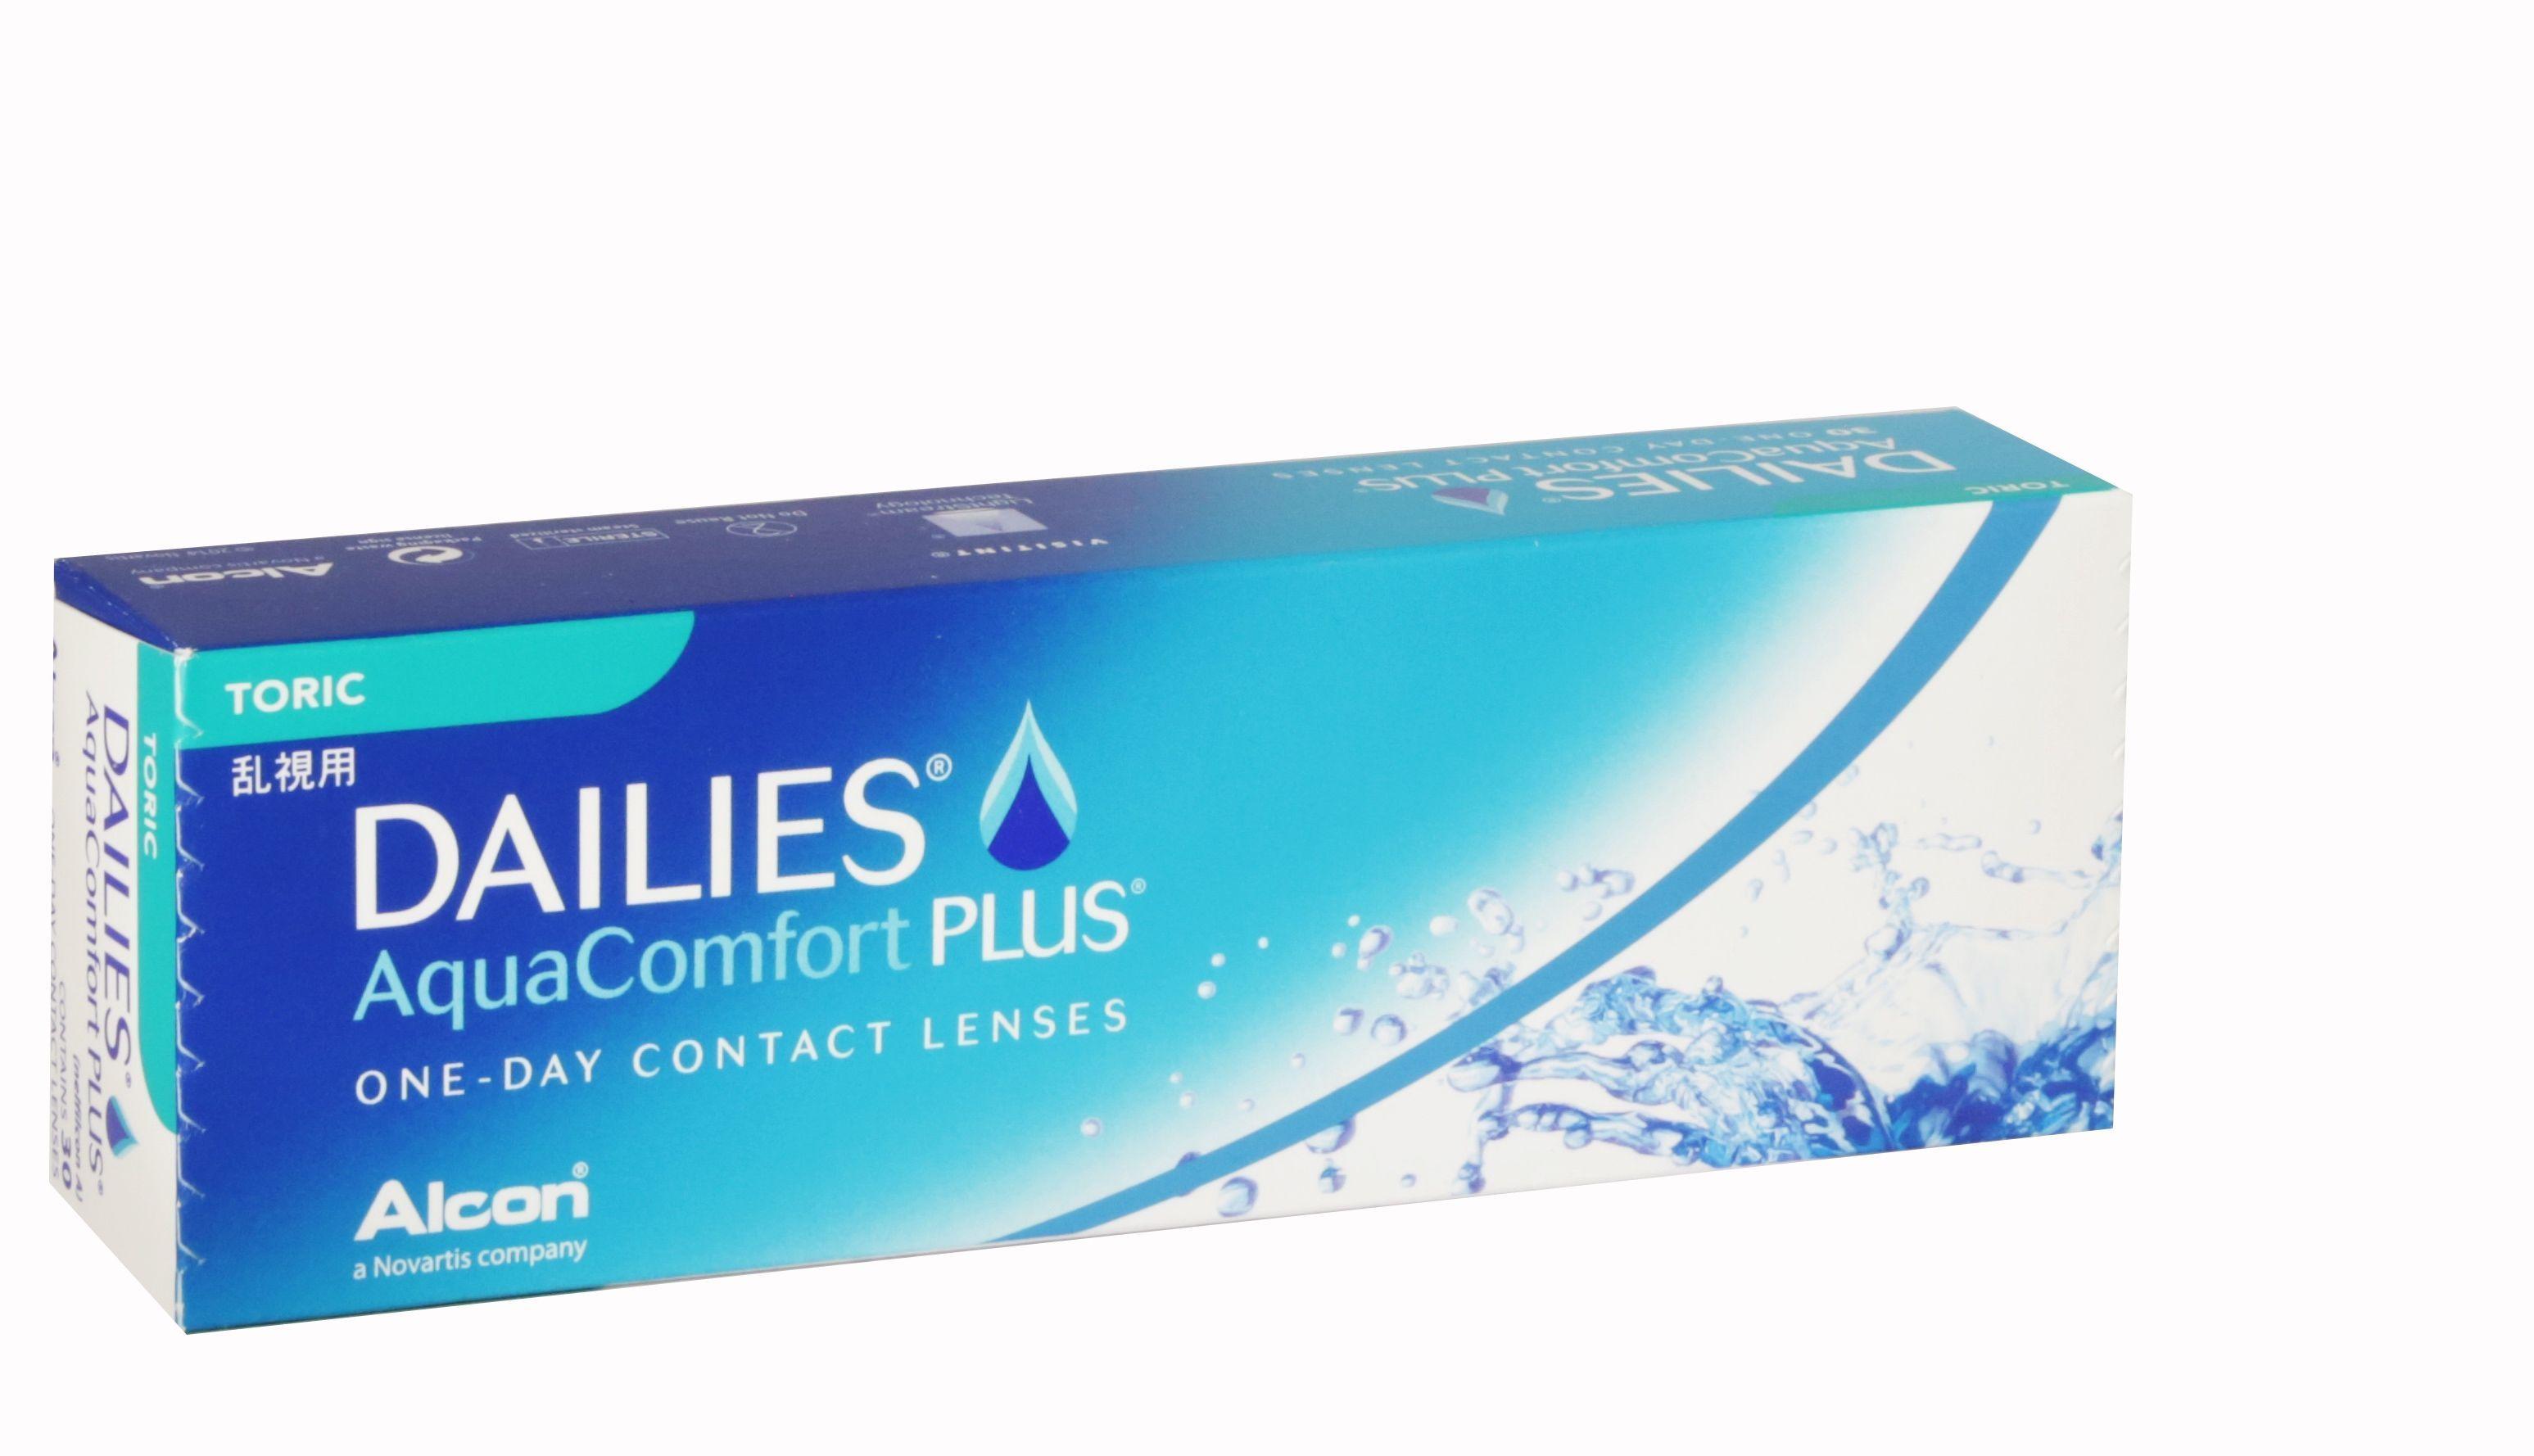 optic shop plus comfort aqua aquacomfort thaihuot comforter s alcon dailies